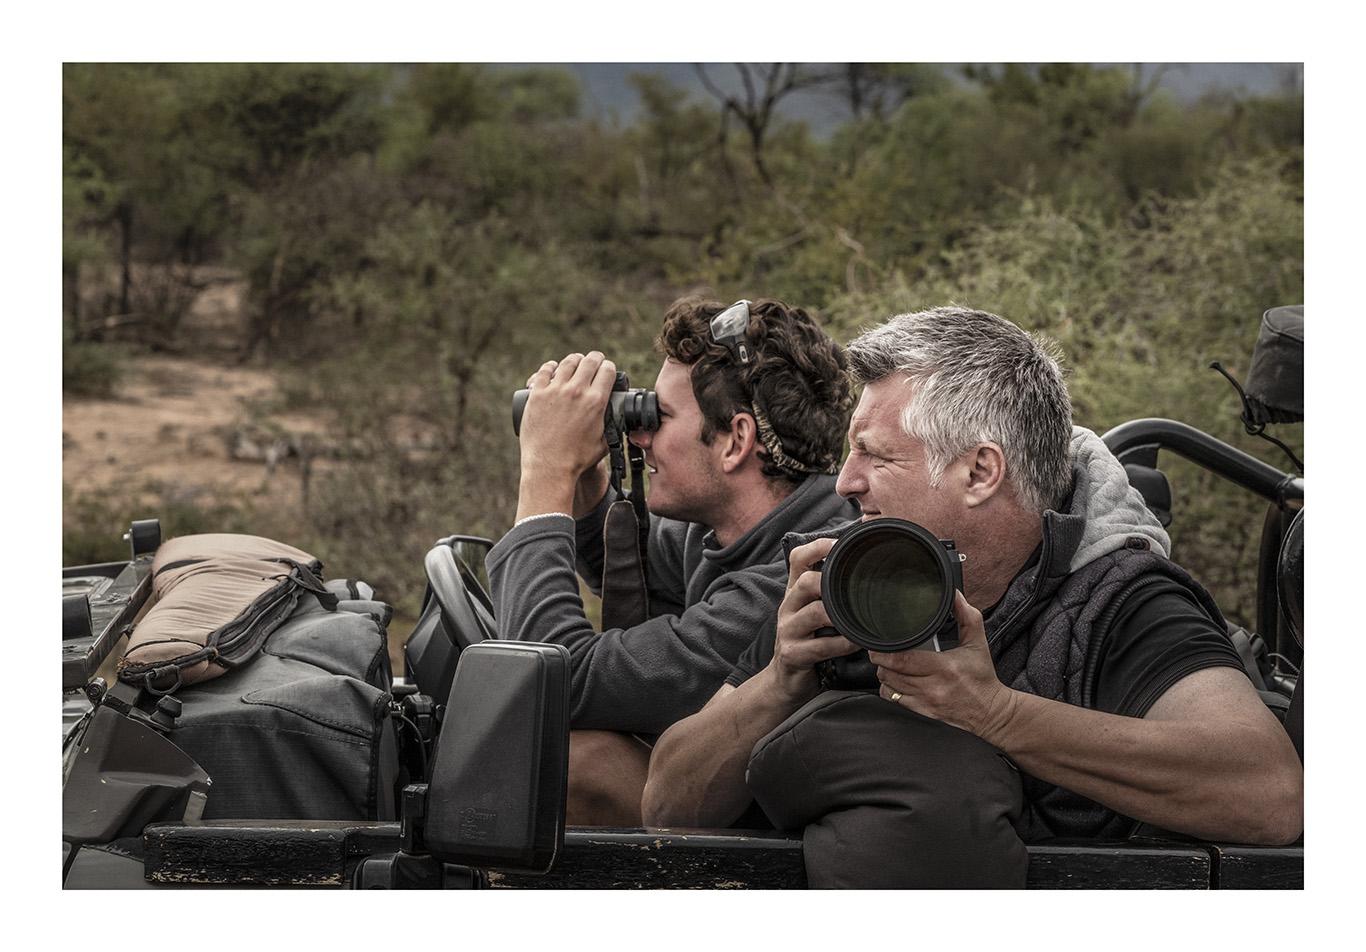 Peter Delaney Wildlife Photographer, FujiFilm X-Photographer